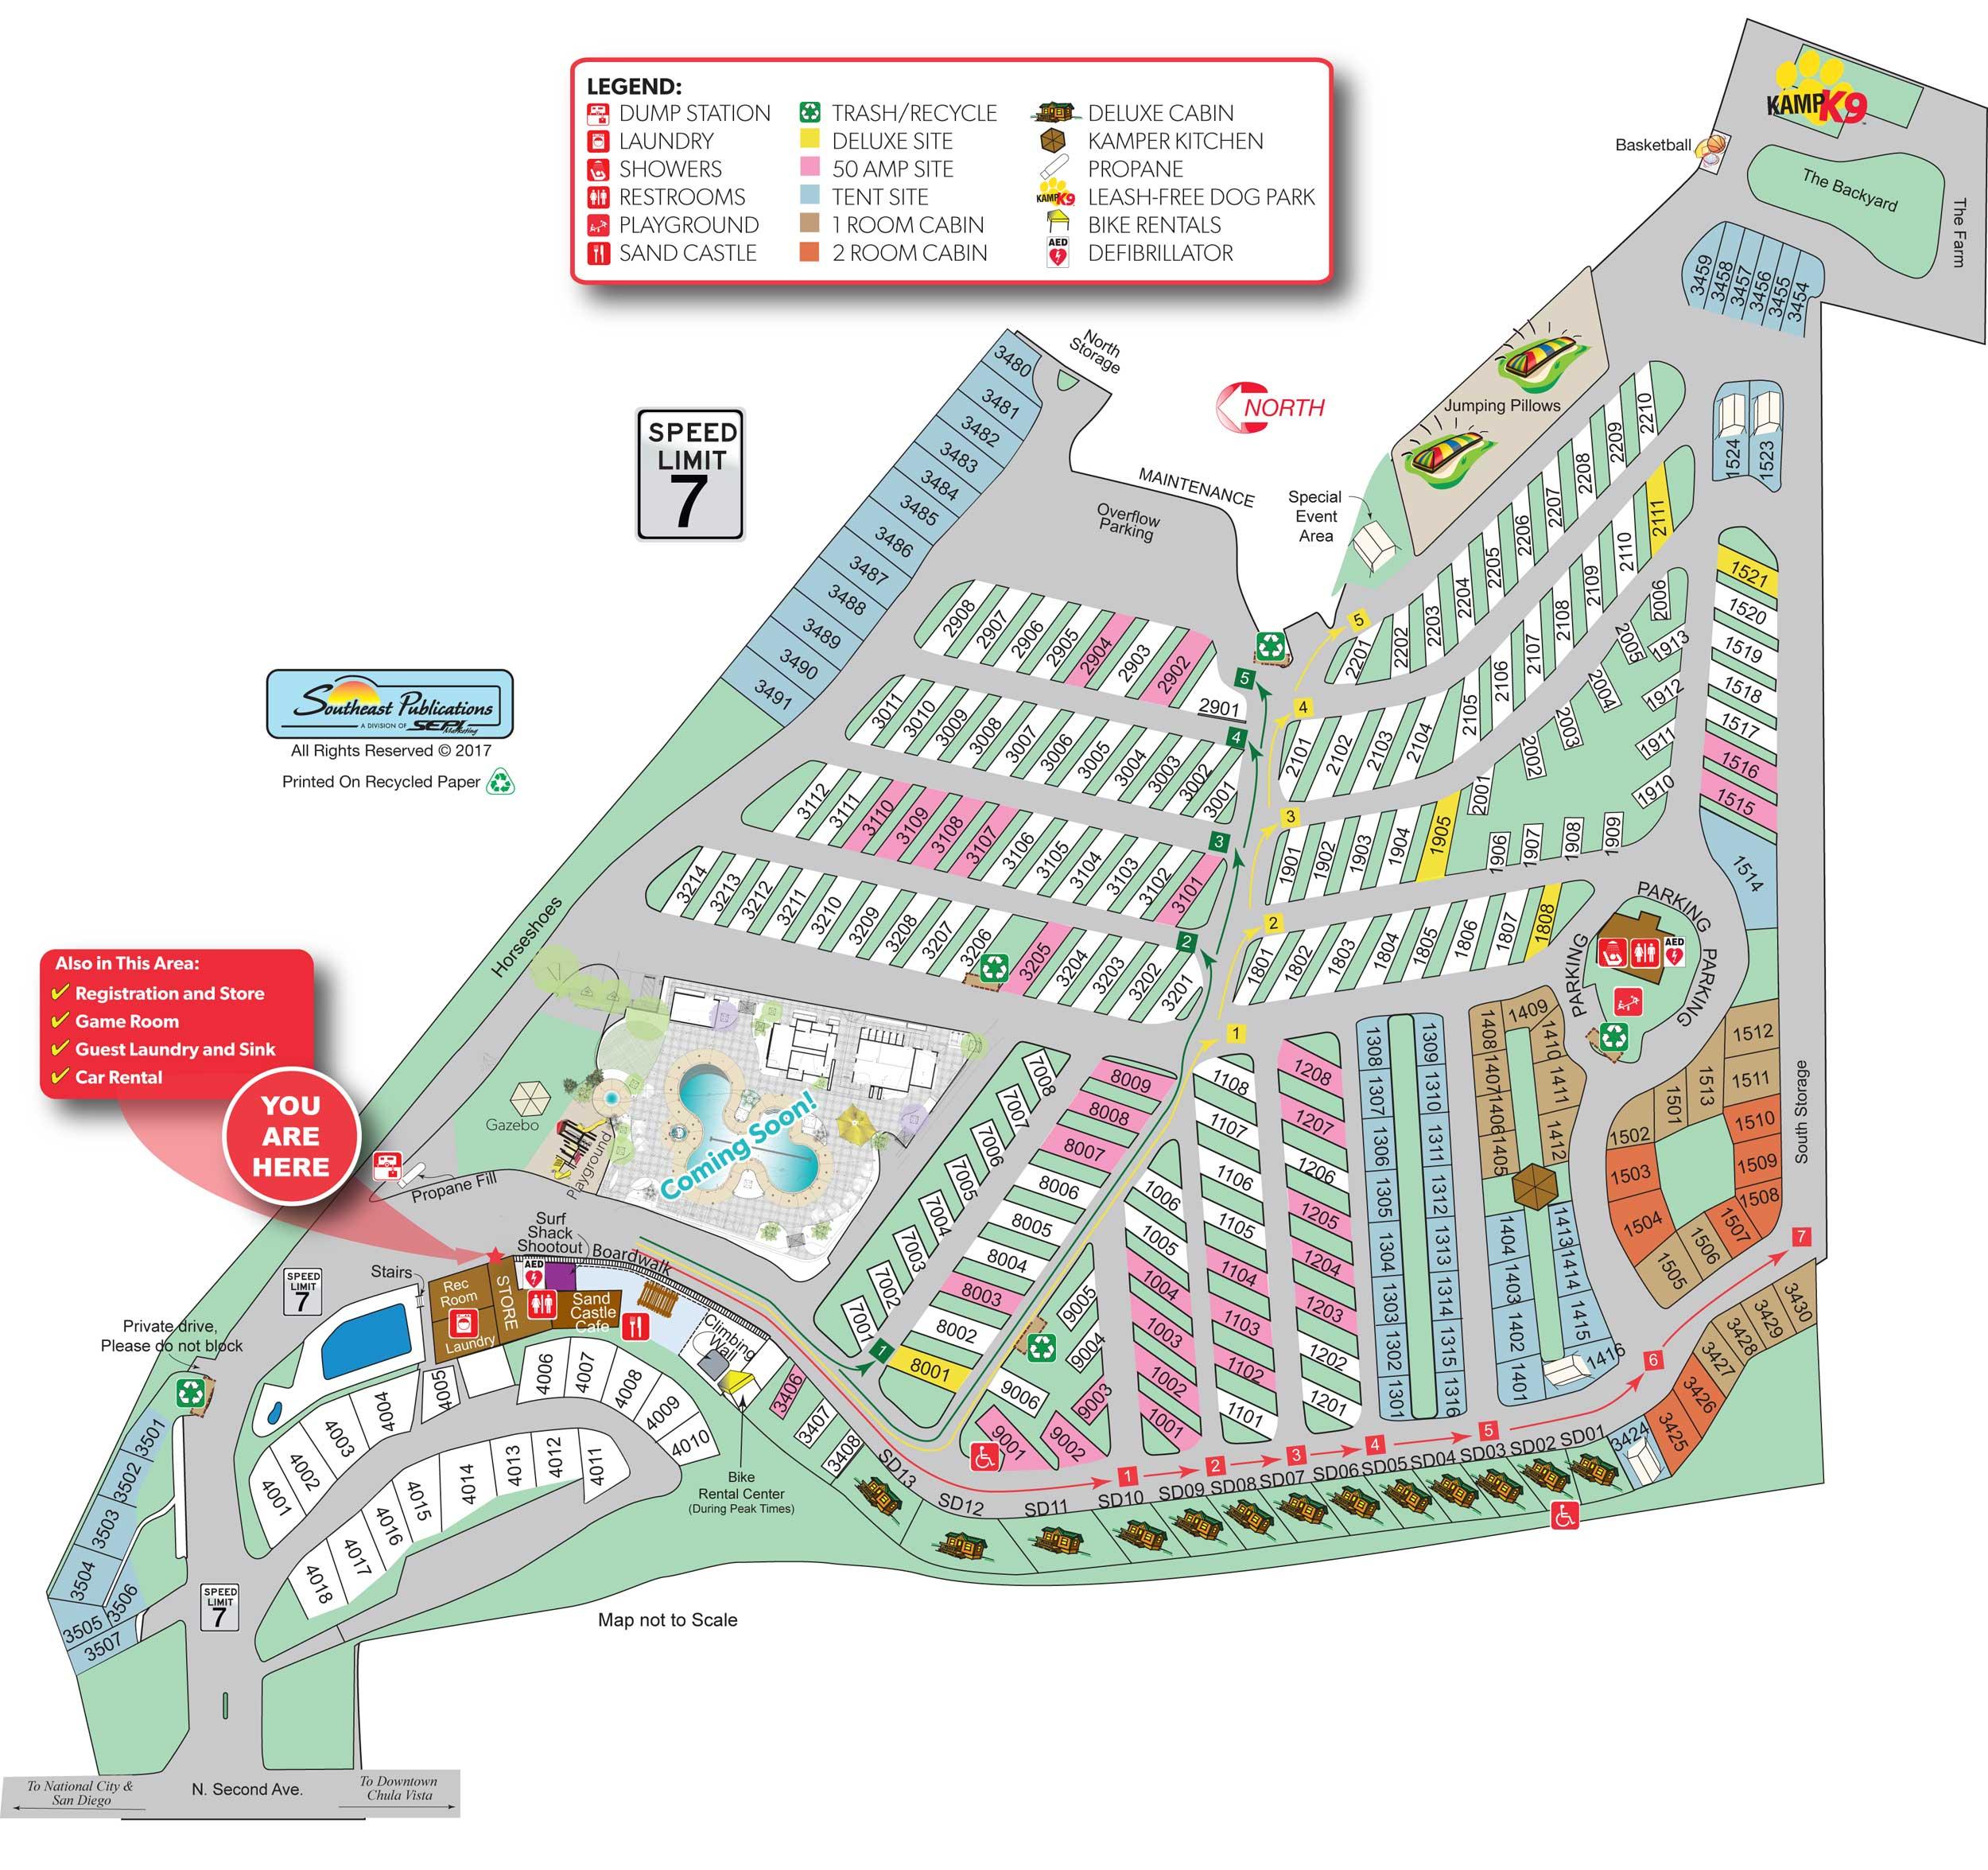 Chula Vista, California Campground | San Diego Metro Koa - California Camping Sites Map